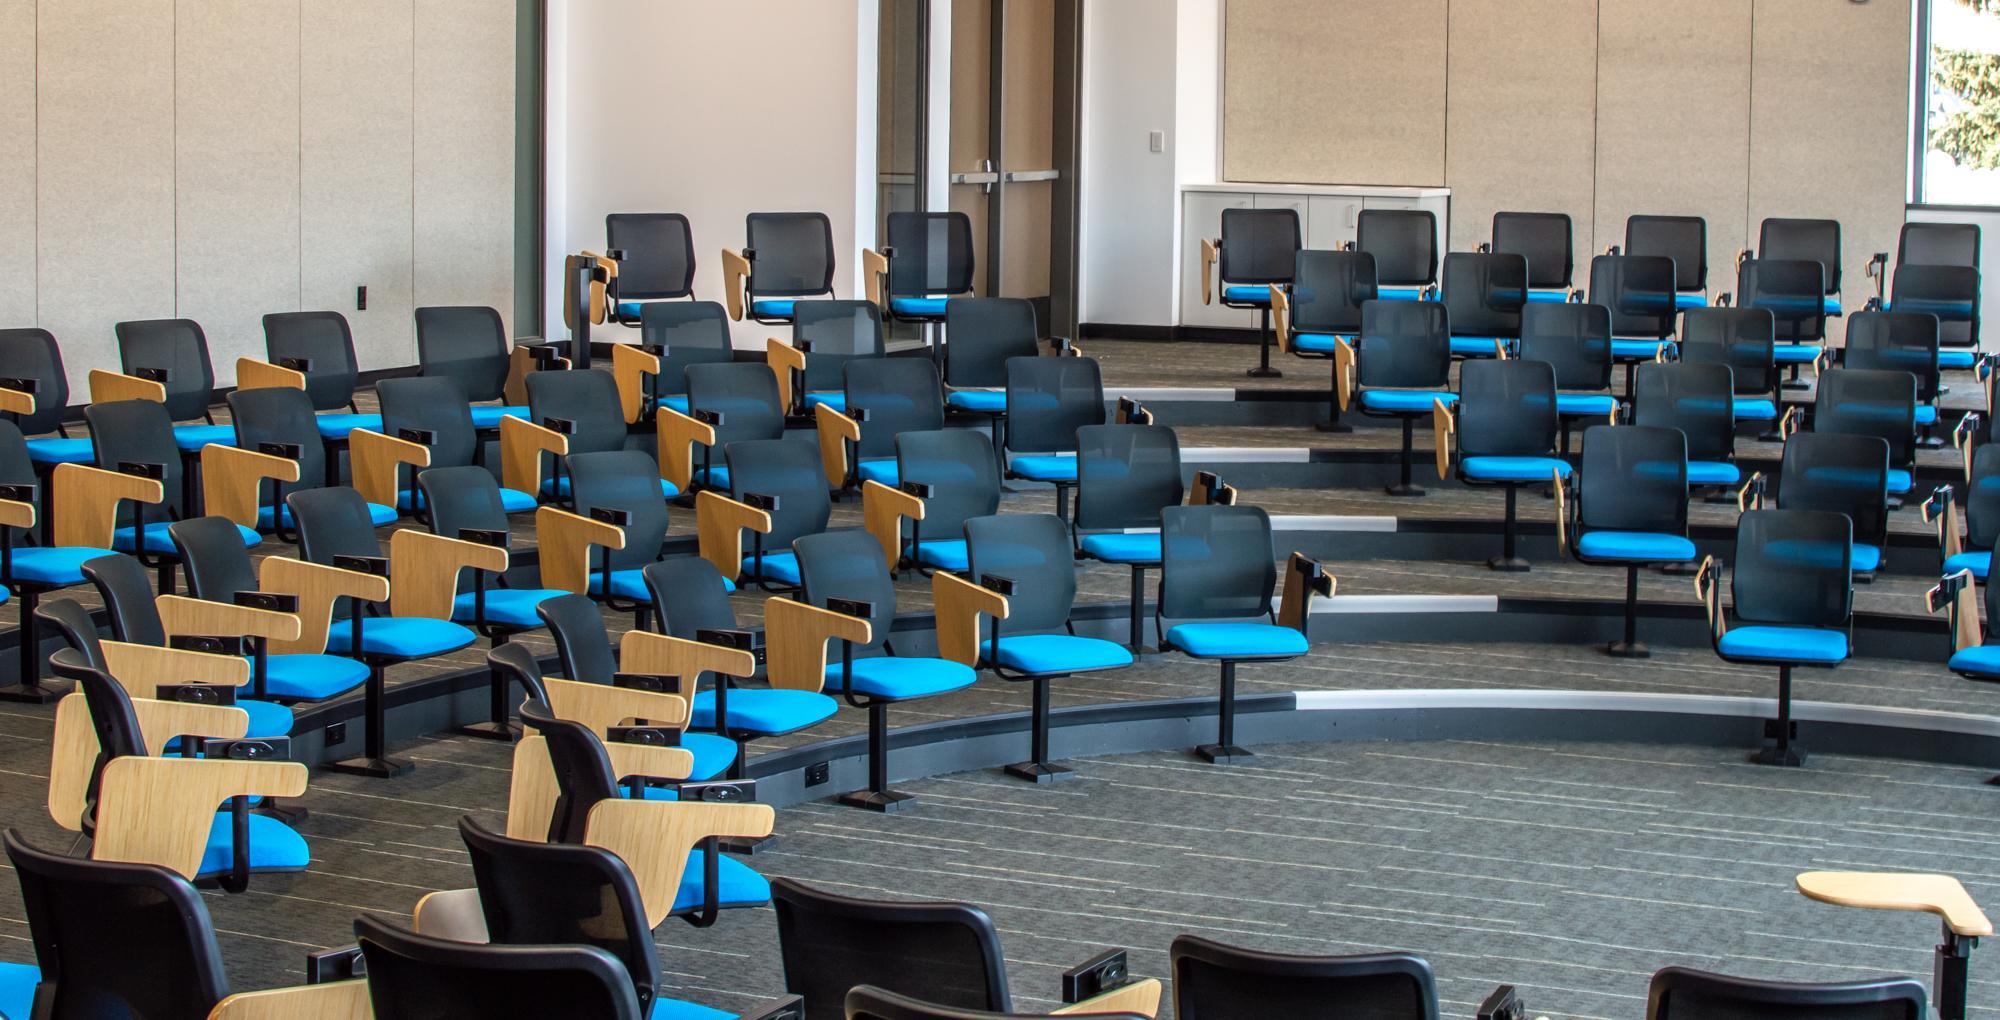 Asbjornson Hall has a round theater-style classroom